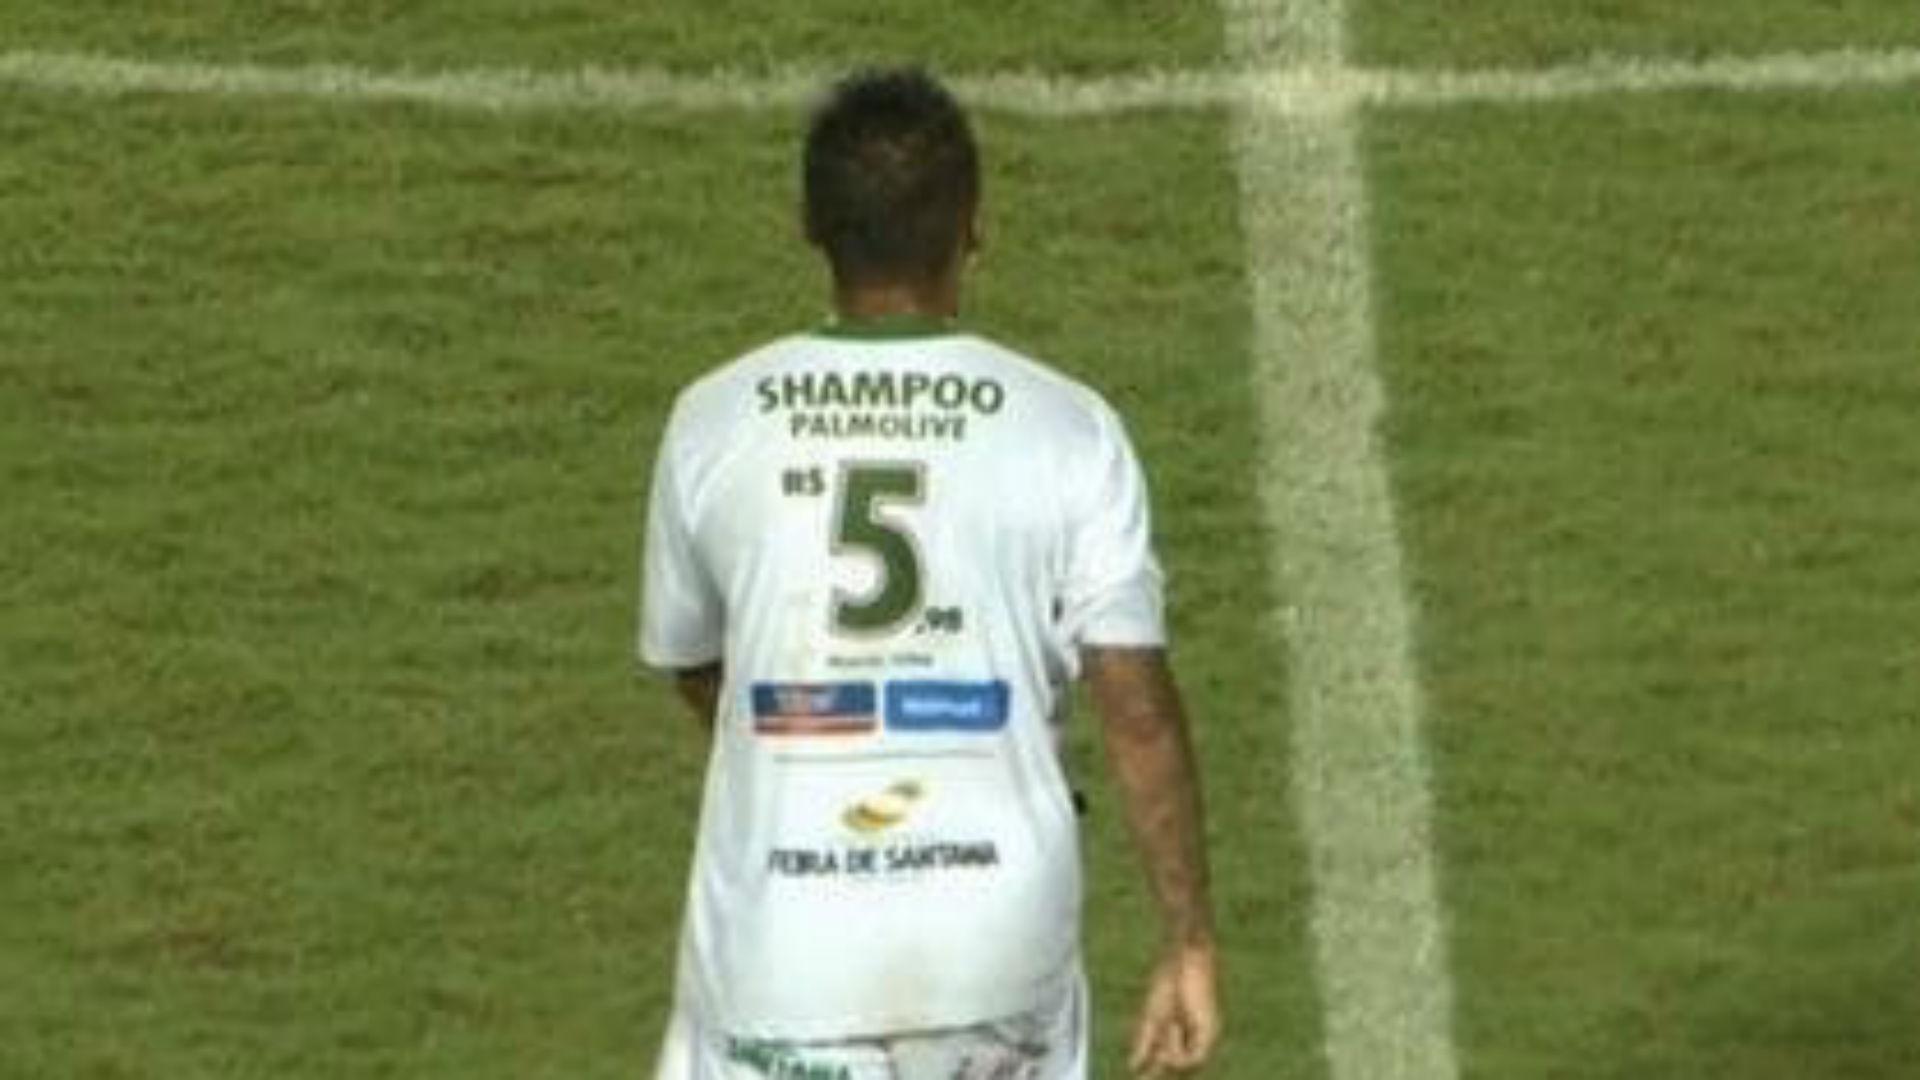 Brazilian Serie D side Flu de Feira launch novel shirt number sponsorship